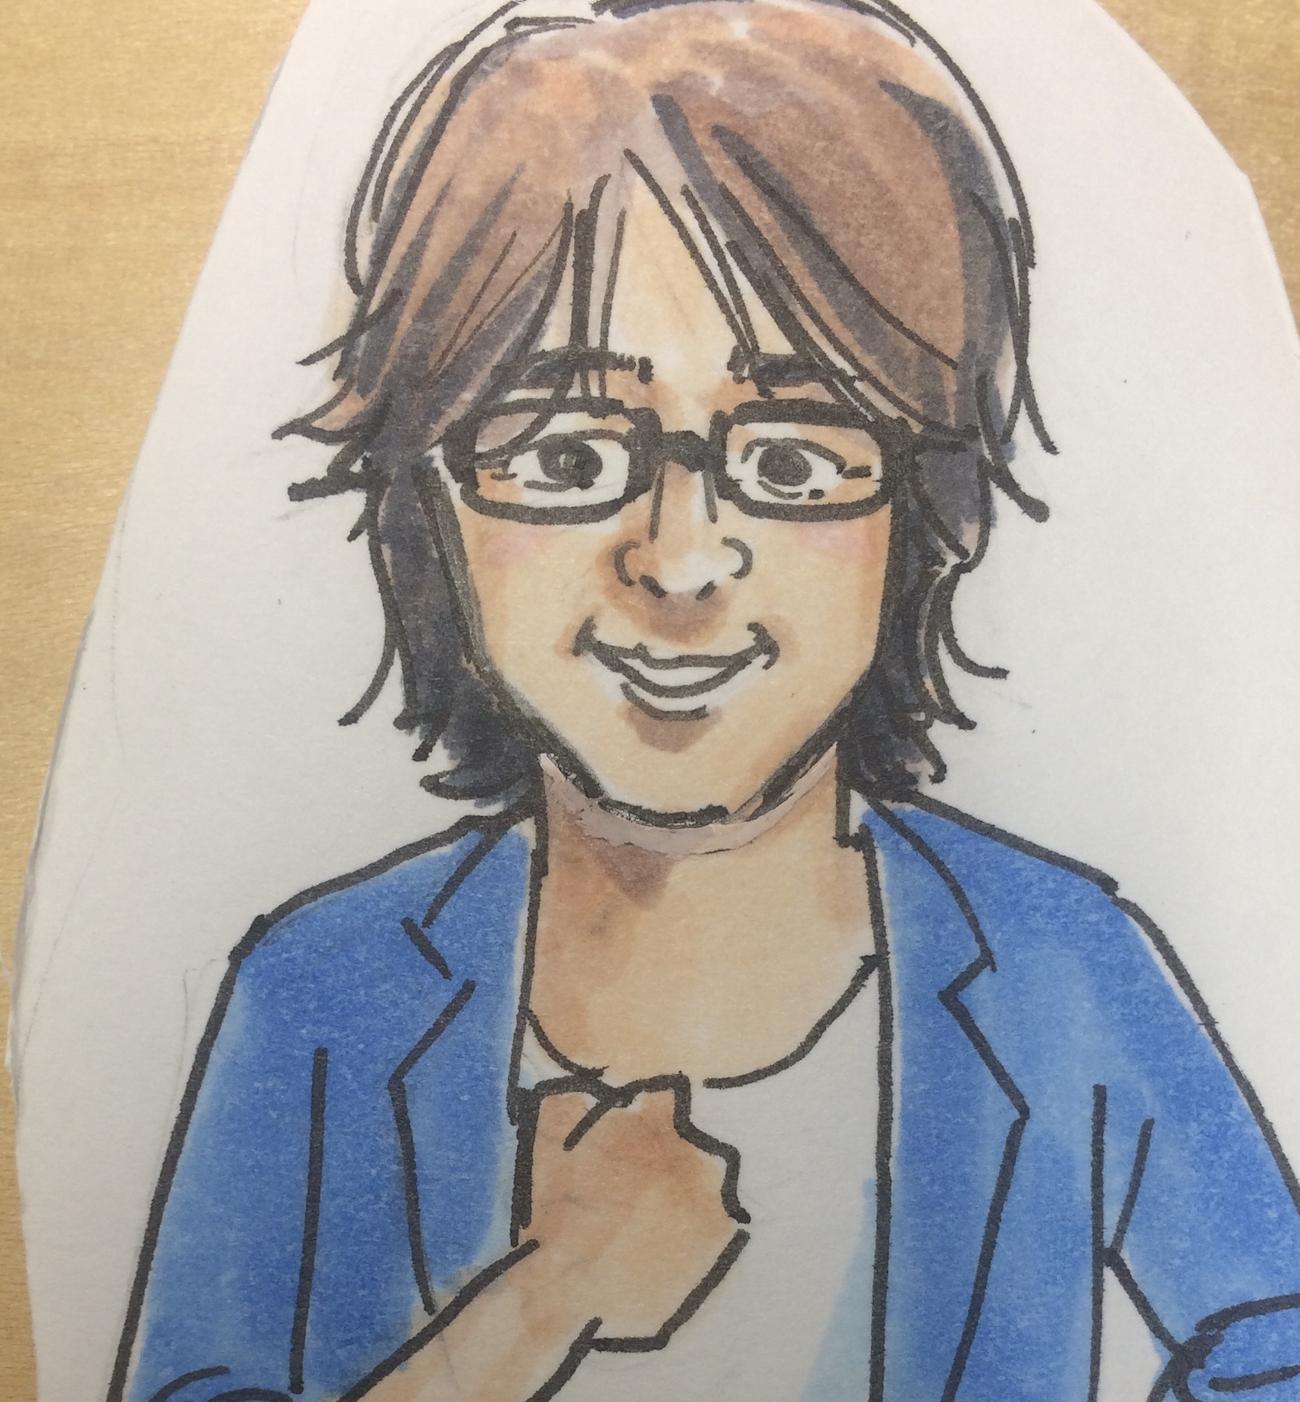 吉野勝己の画像